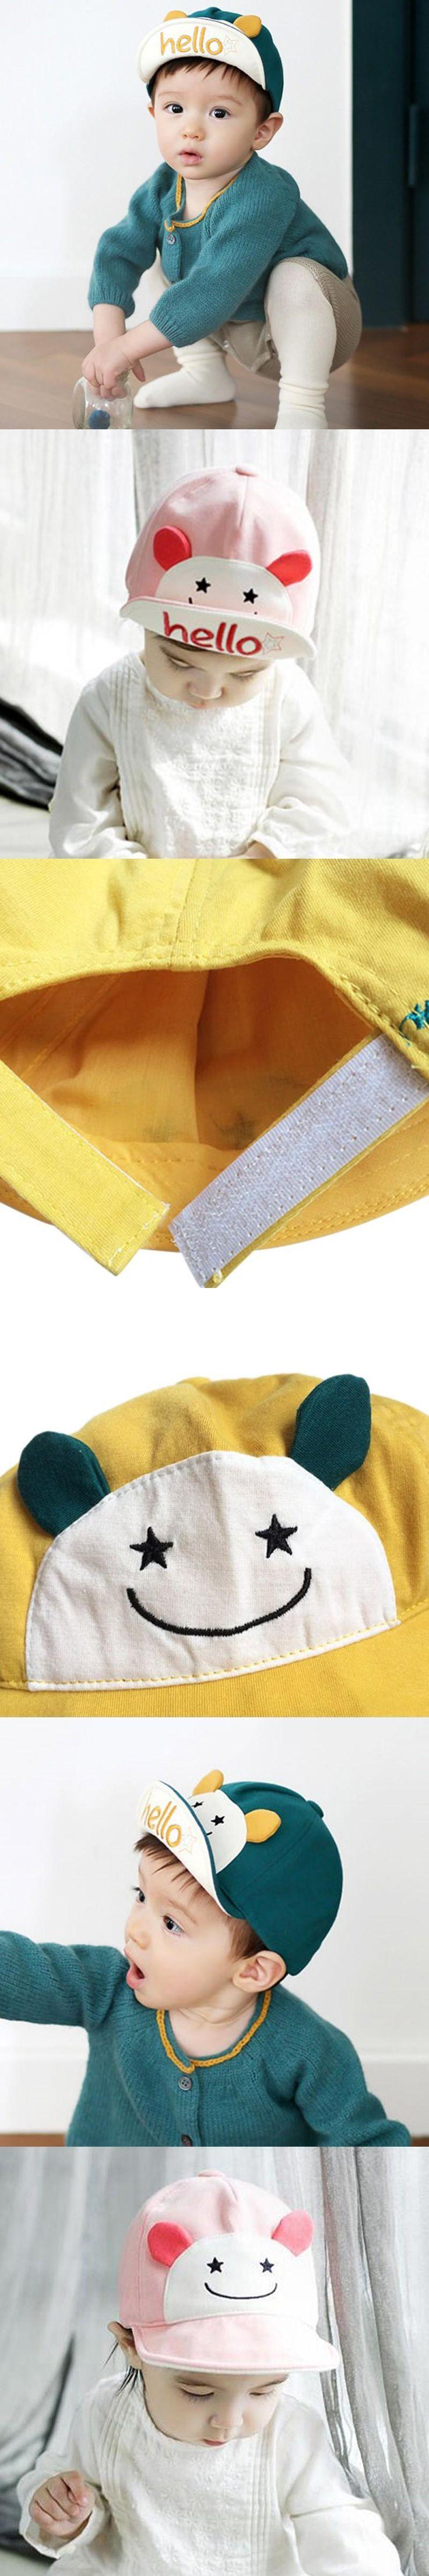 Hello Animal Cartoon Baby Hat Kids Baseball Cap Palm Cute Baby Boy Girl Beanies Soft Cotton Caps Infant Visors Sun Hat